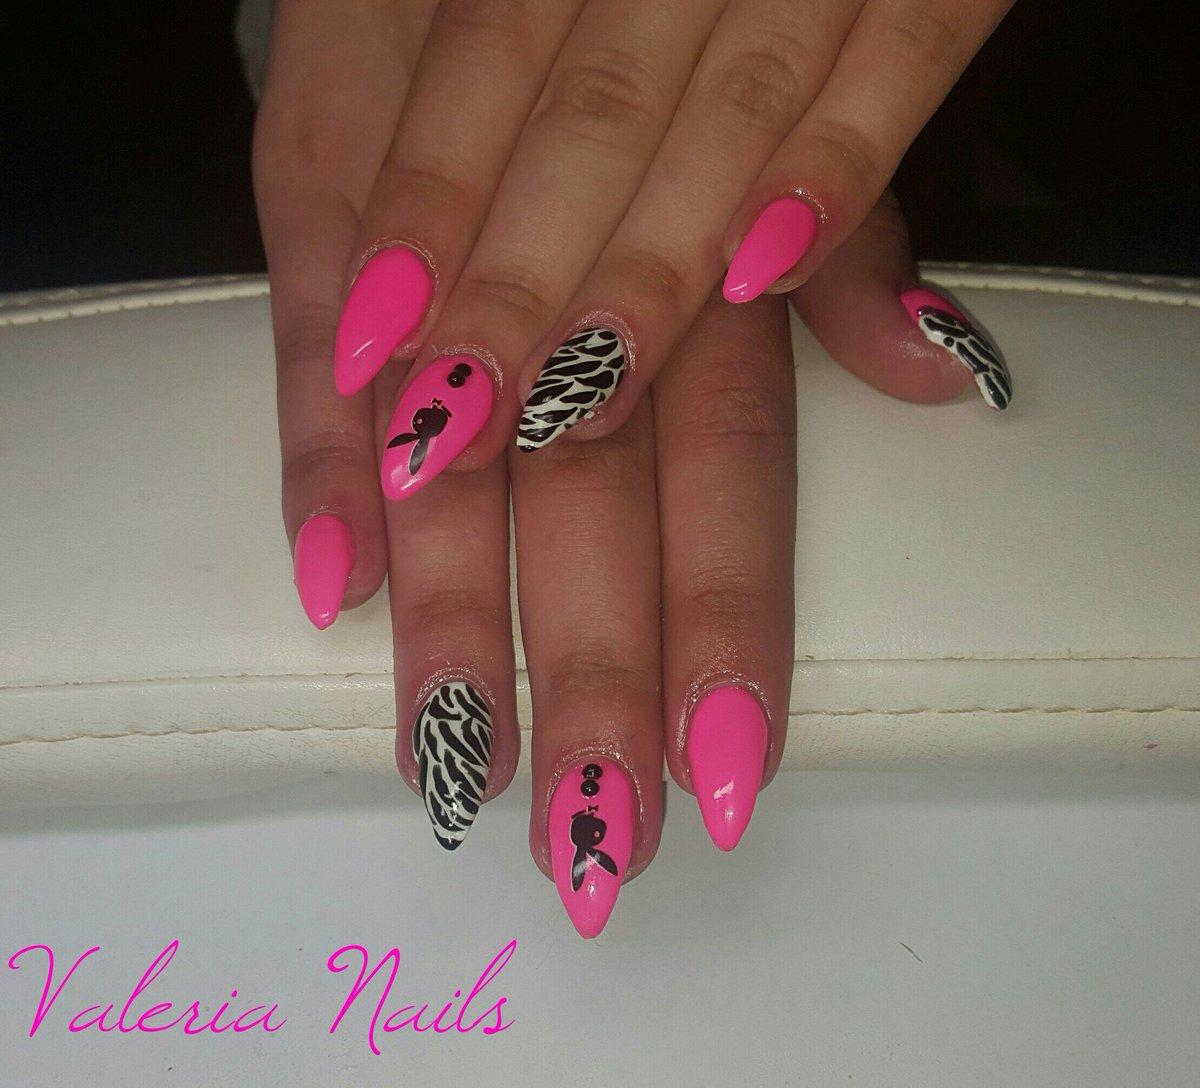 Valeria On Twitter Refil Unghie Nails Gel Rosa Fluo Neon